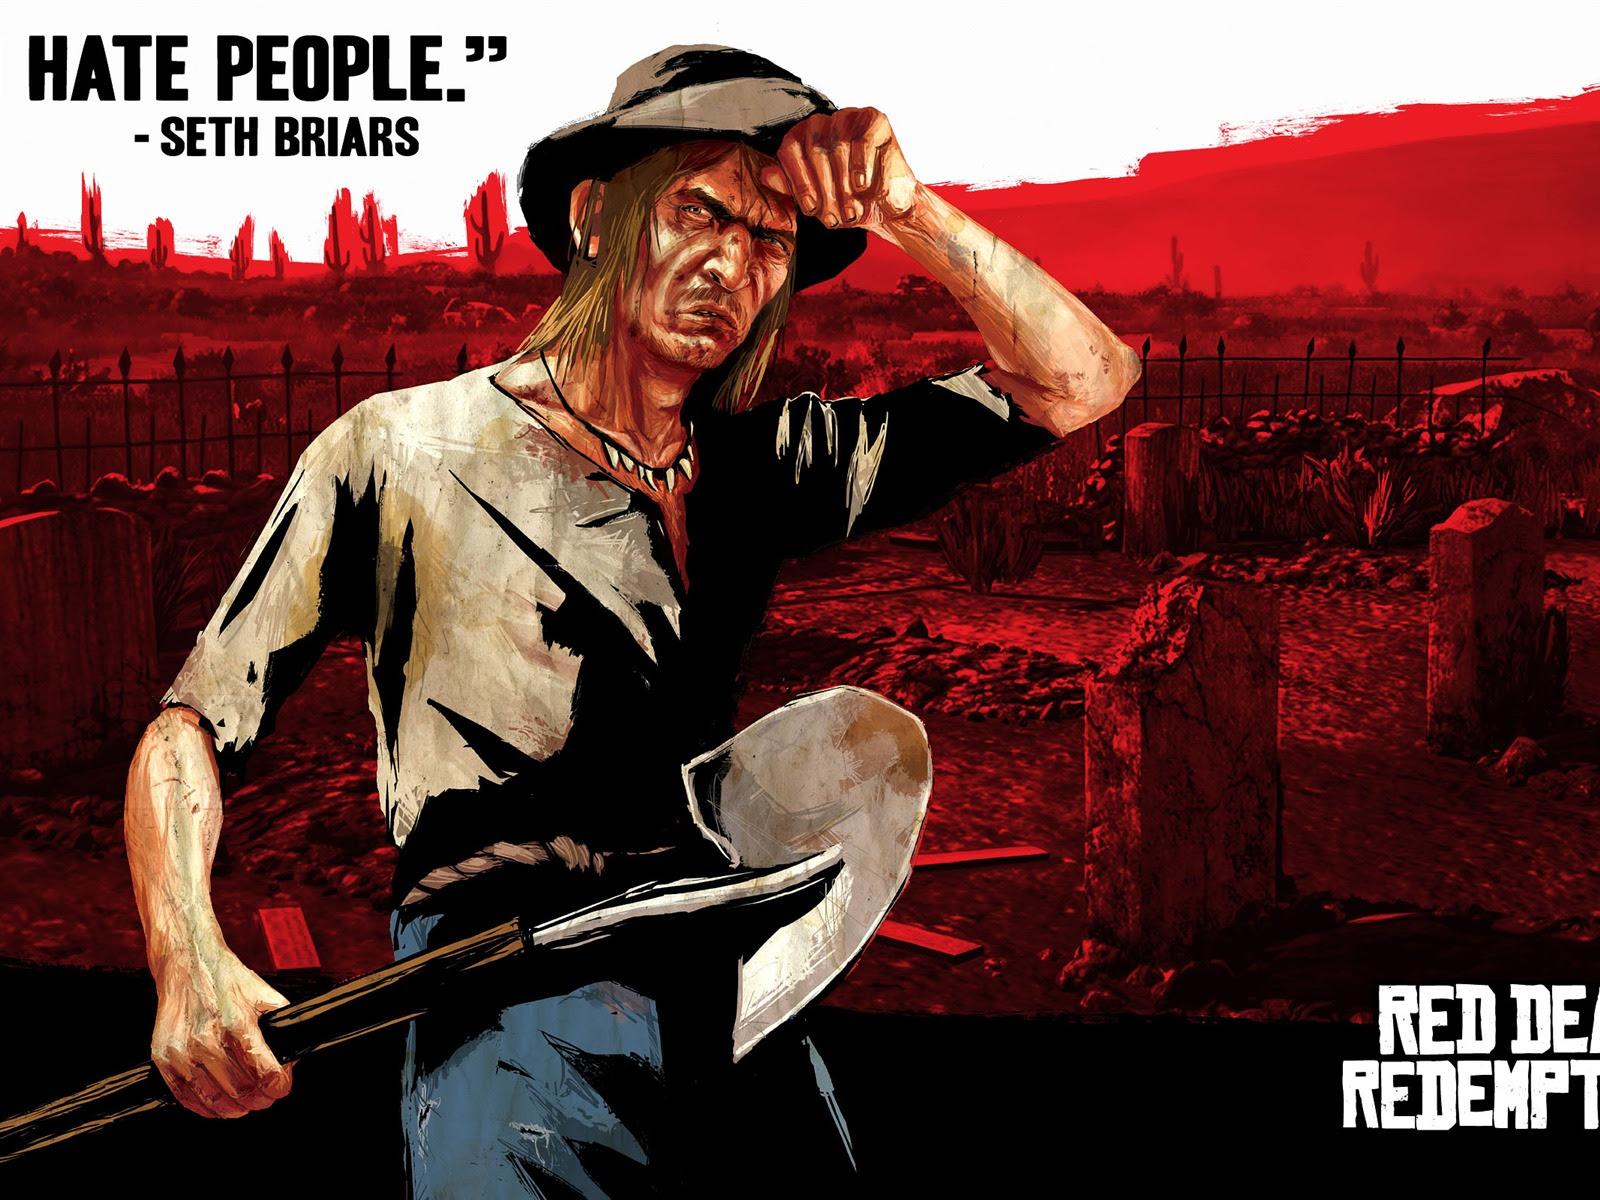 Red Dead Redemption Hd Wallpaper 23 1600x1200 Wallpaper